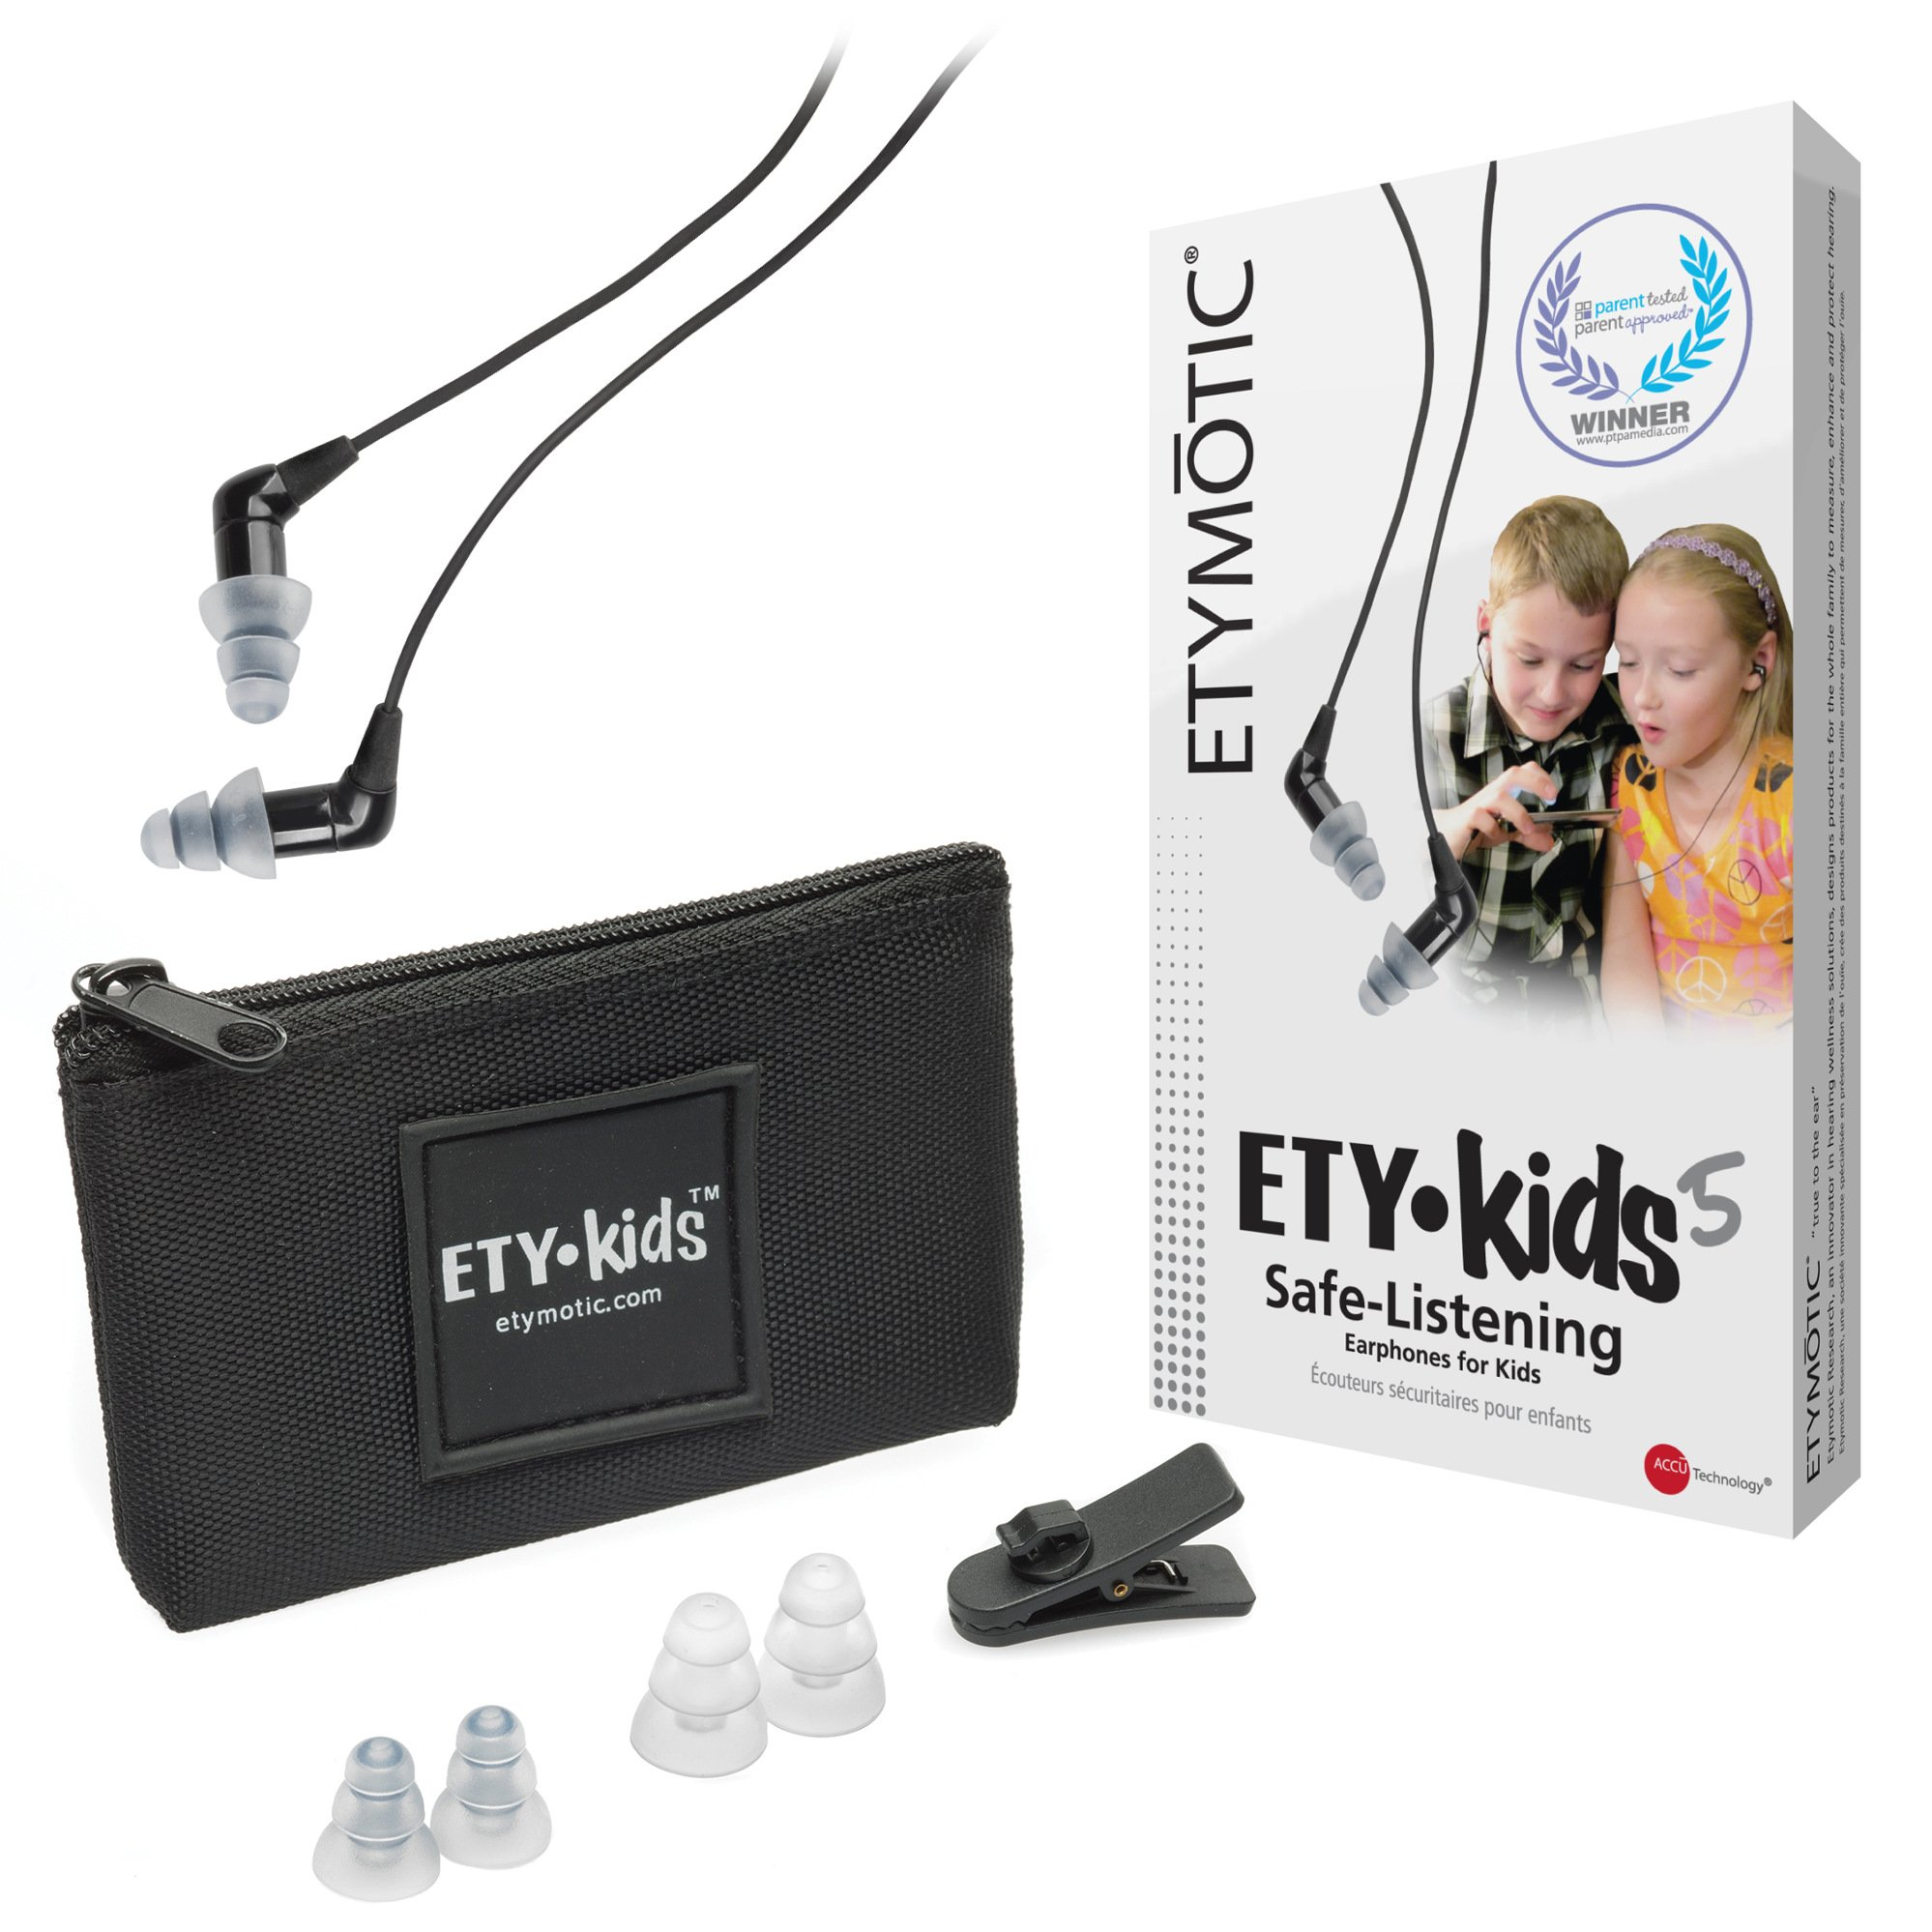 Childrens Safe-Listening Earphones